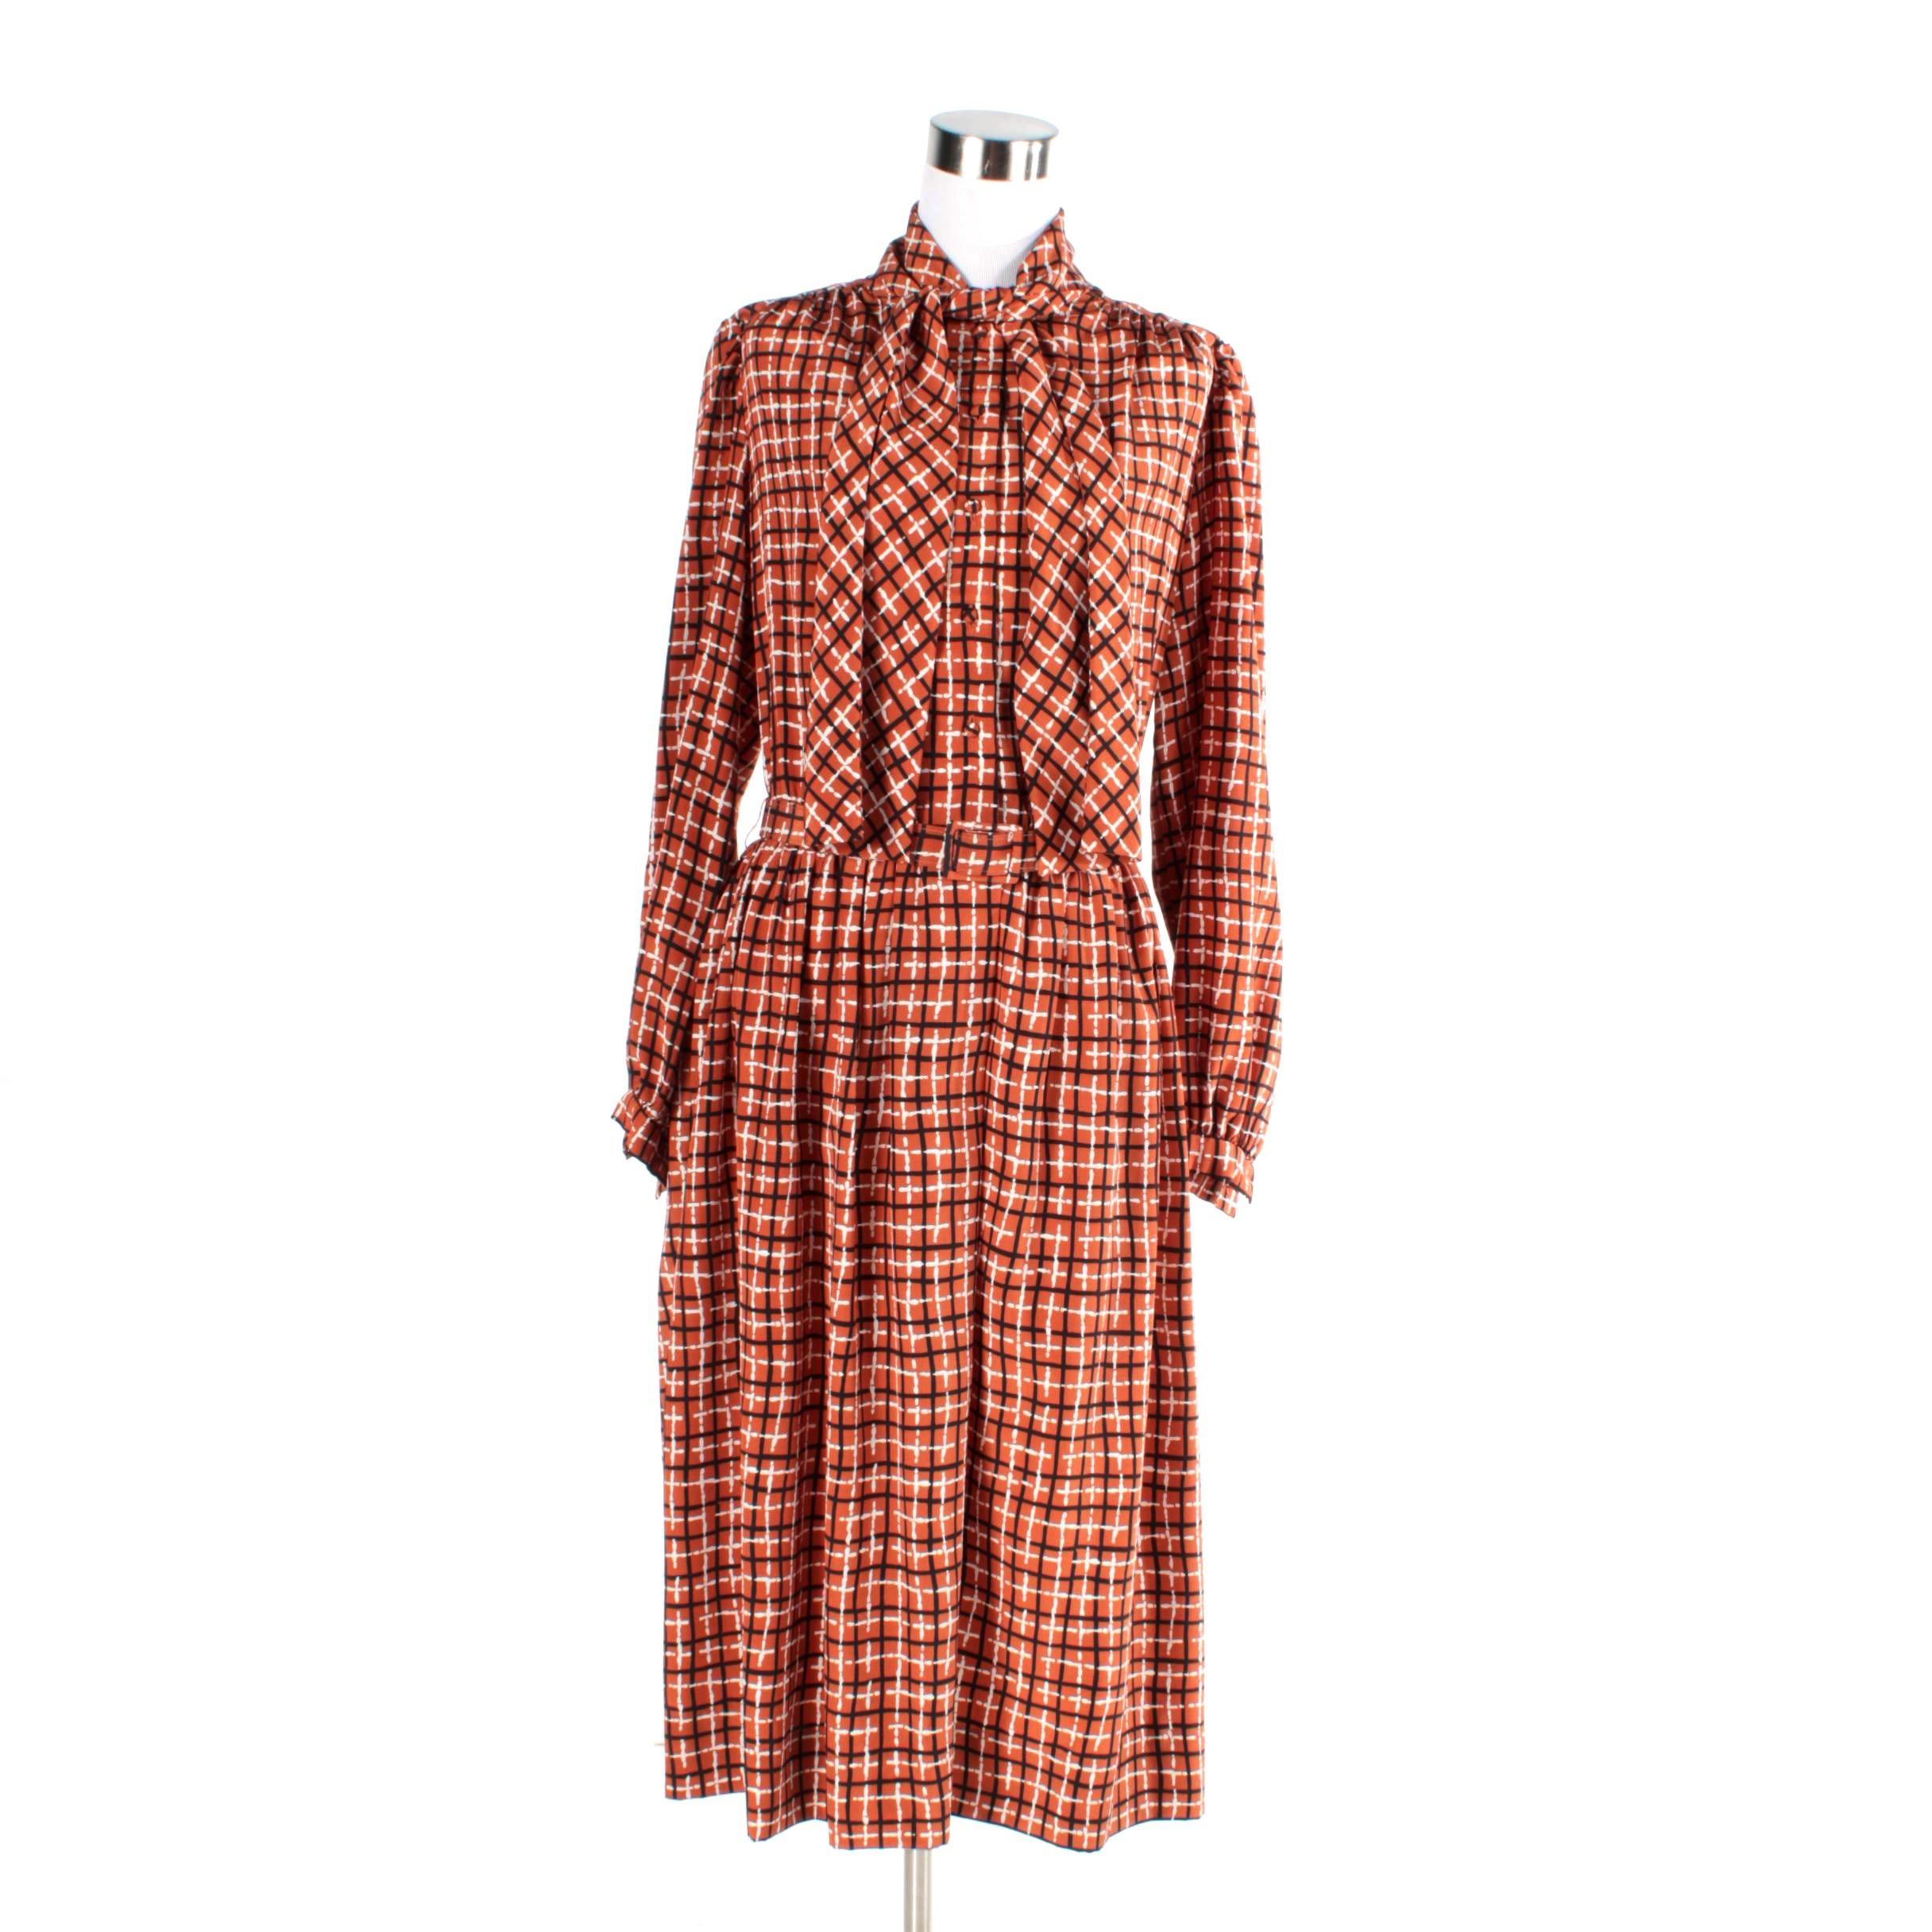 1970s Pauline Trigere Trigeresport for Schrader Dress